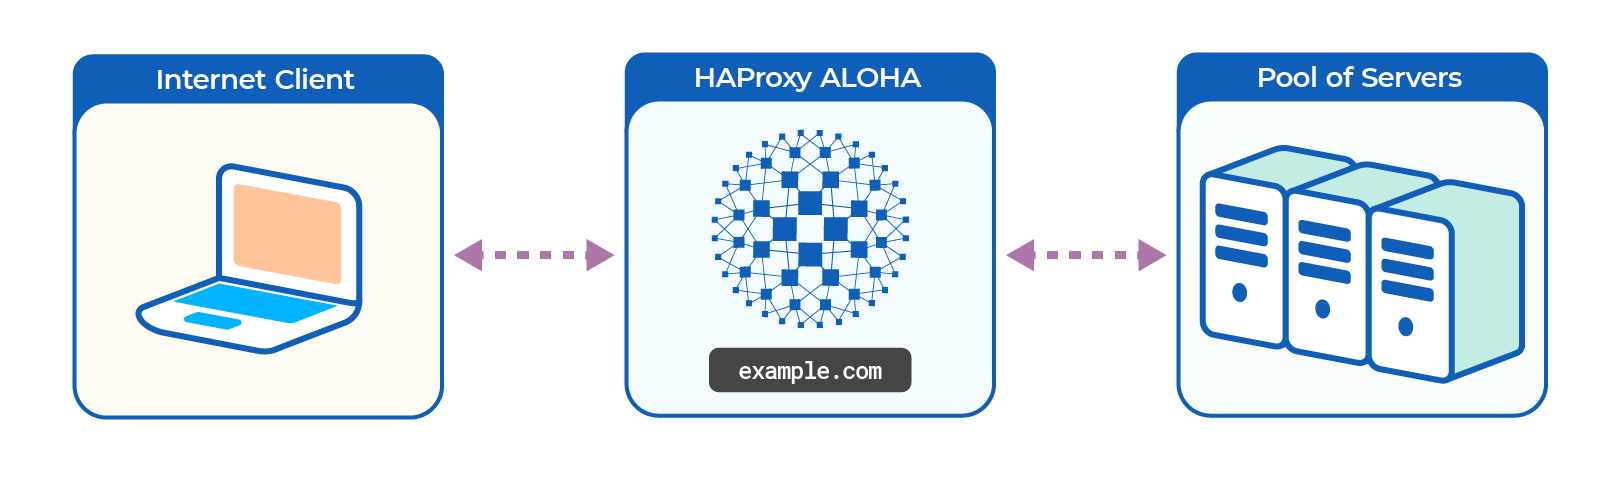 https://cdn.haproxy.com/documentation/aloha/12-5/assets/aloha-overview-c737b3e0e2fe4b264d6fa7af6d63614fb1d945db5bf5804bfabcadfc4c085da8.png